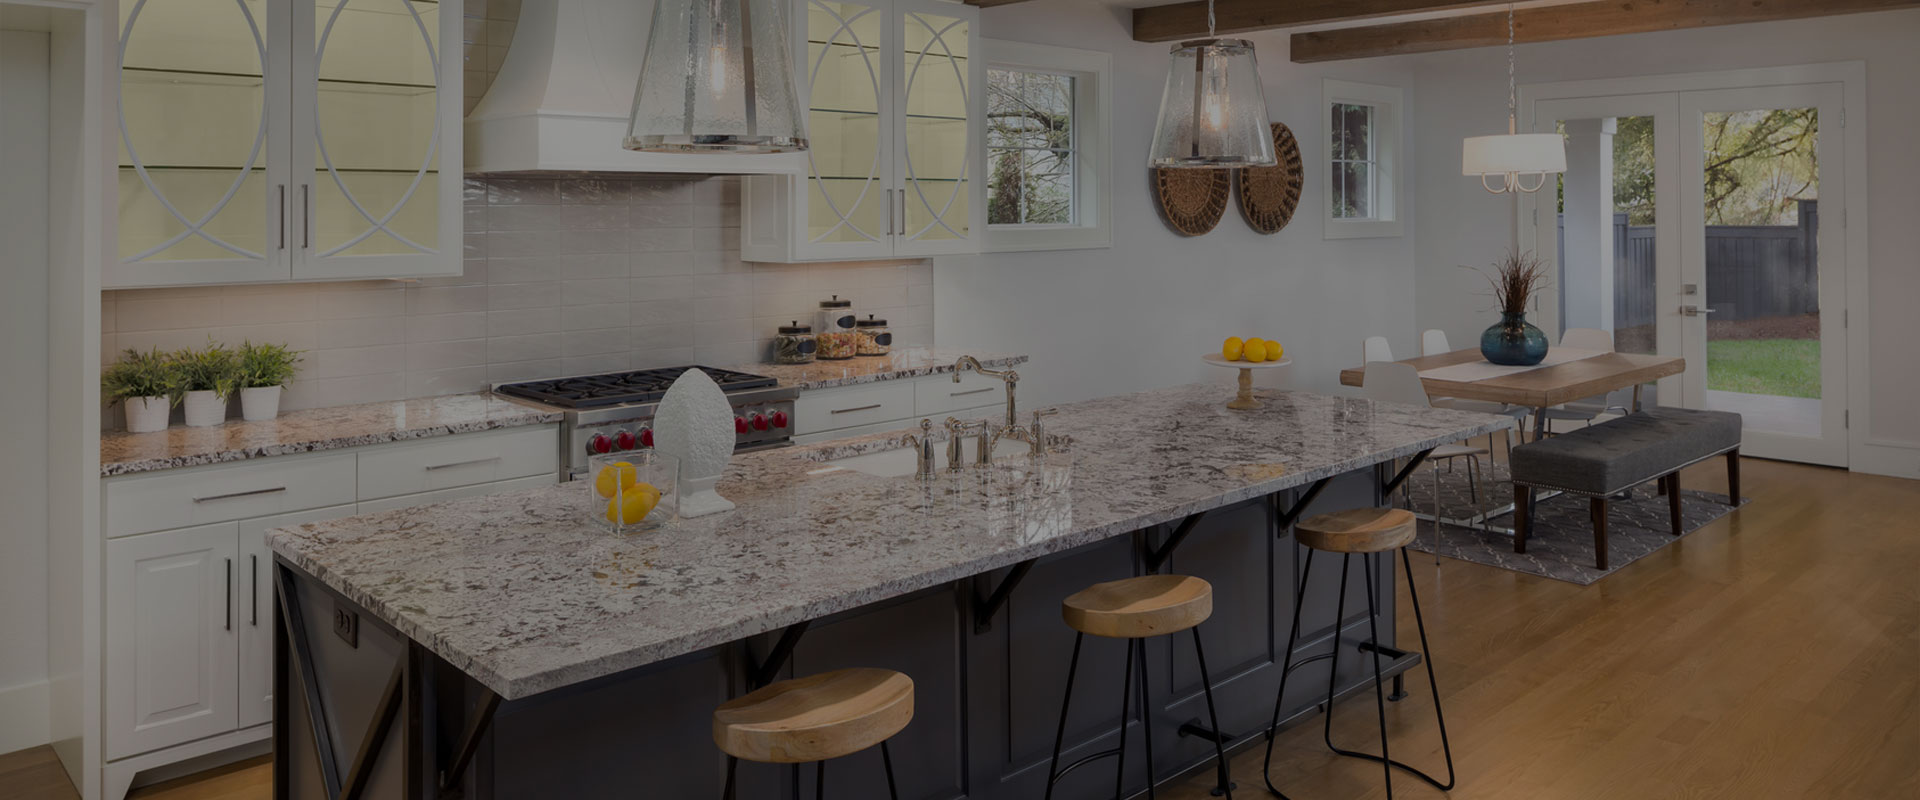 white granite breakfast bar with stools